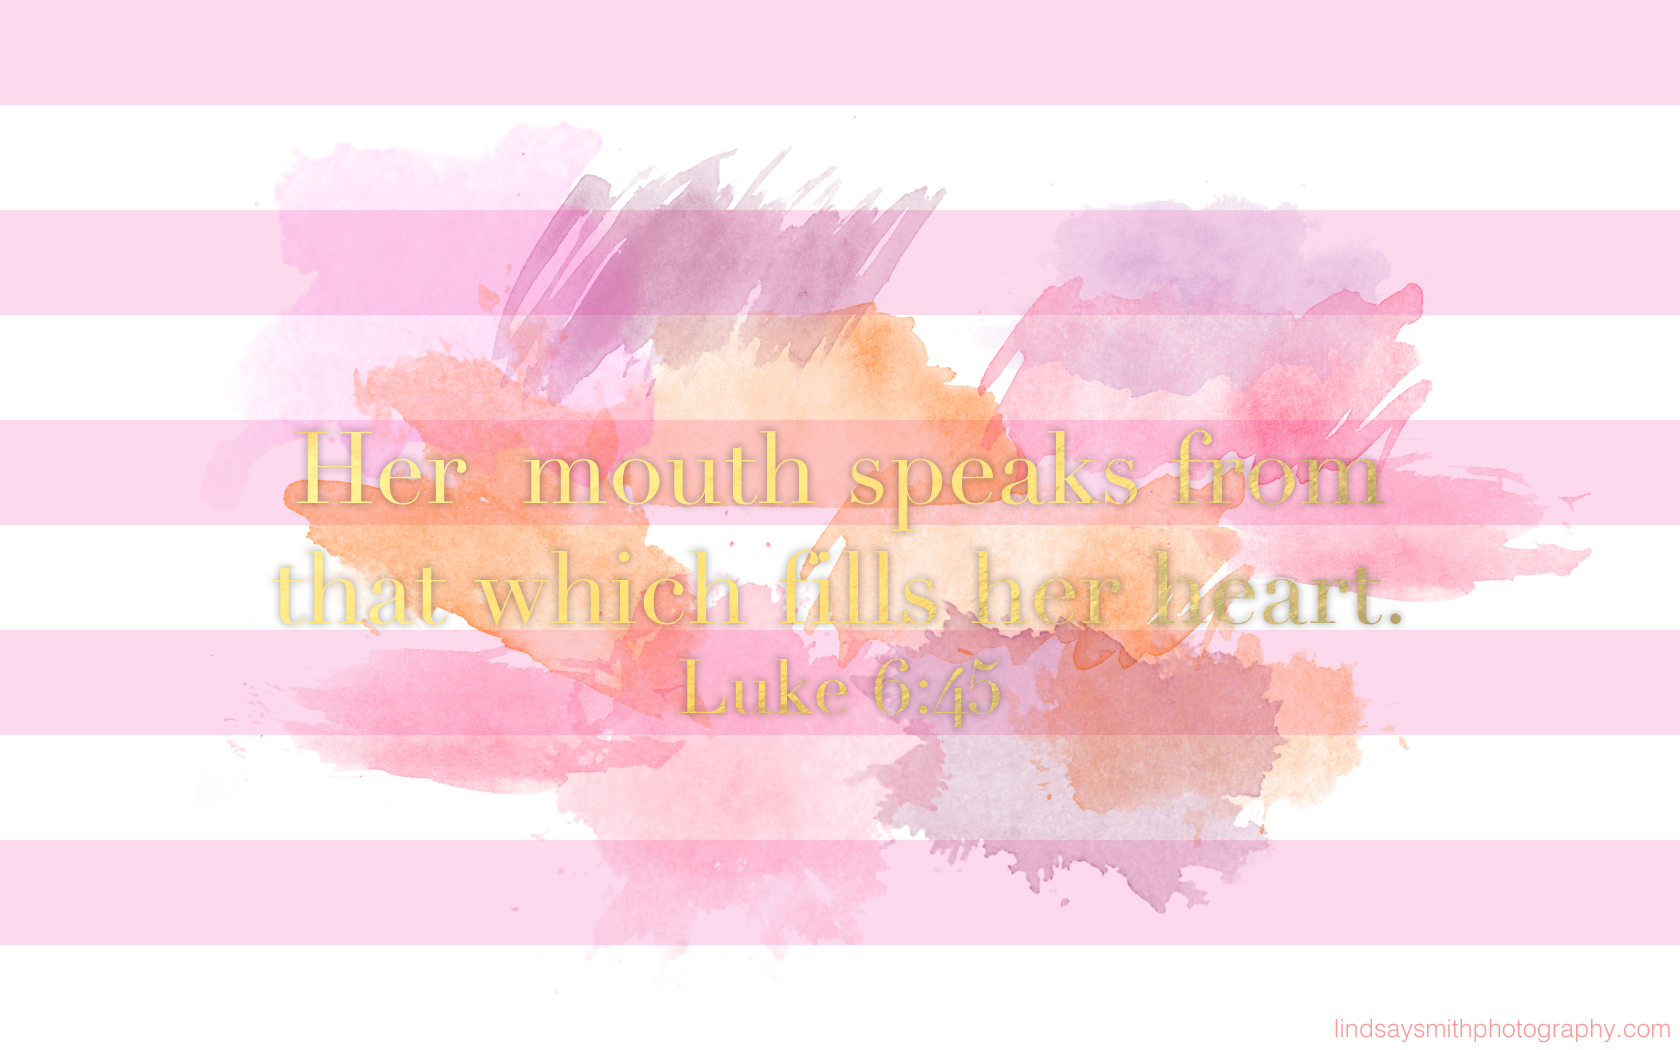 3 Pretty Desktop Backgrounds For Inspiration 187 Lindsay 1680x1050